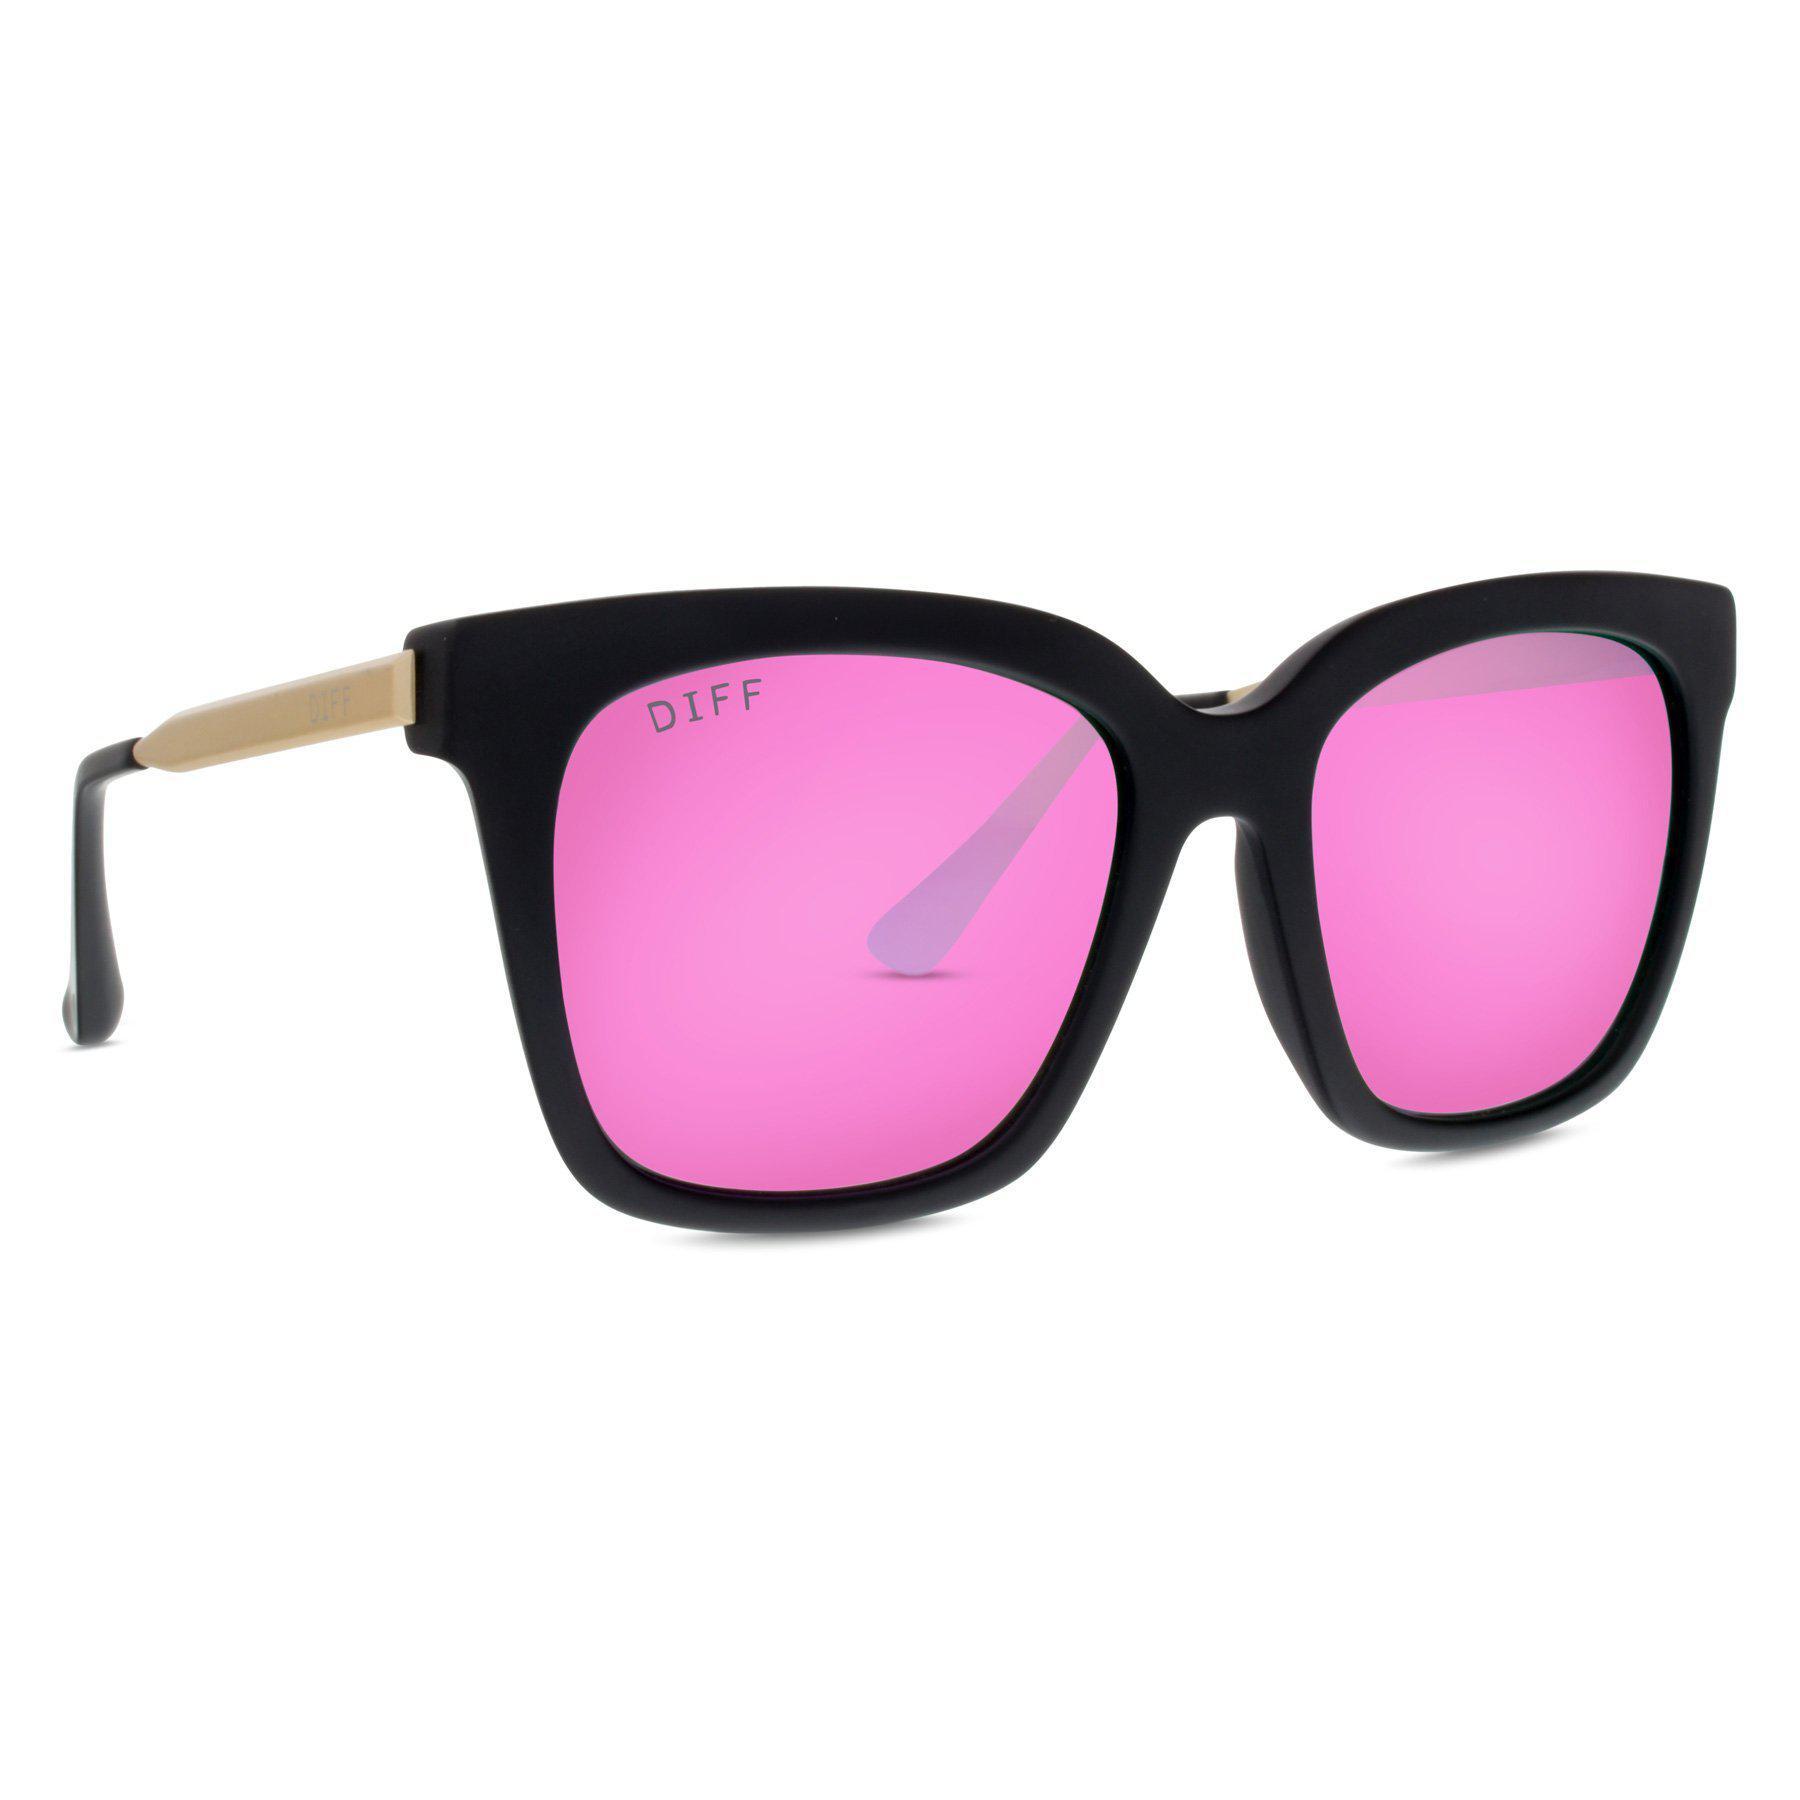 1d60015609862 DIFF Bella - Matte Black + Pink Mirror + Polarized in Pink - Lyst